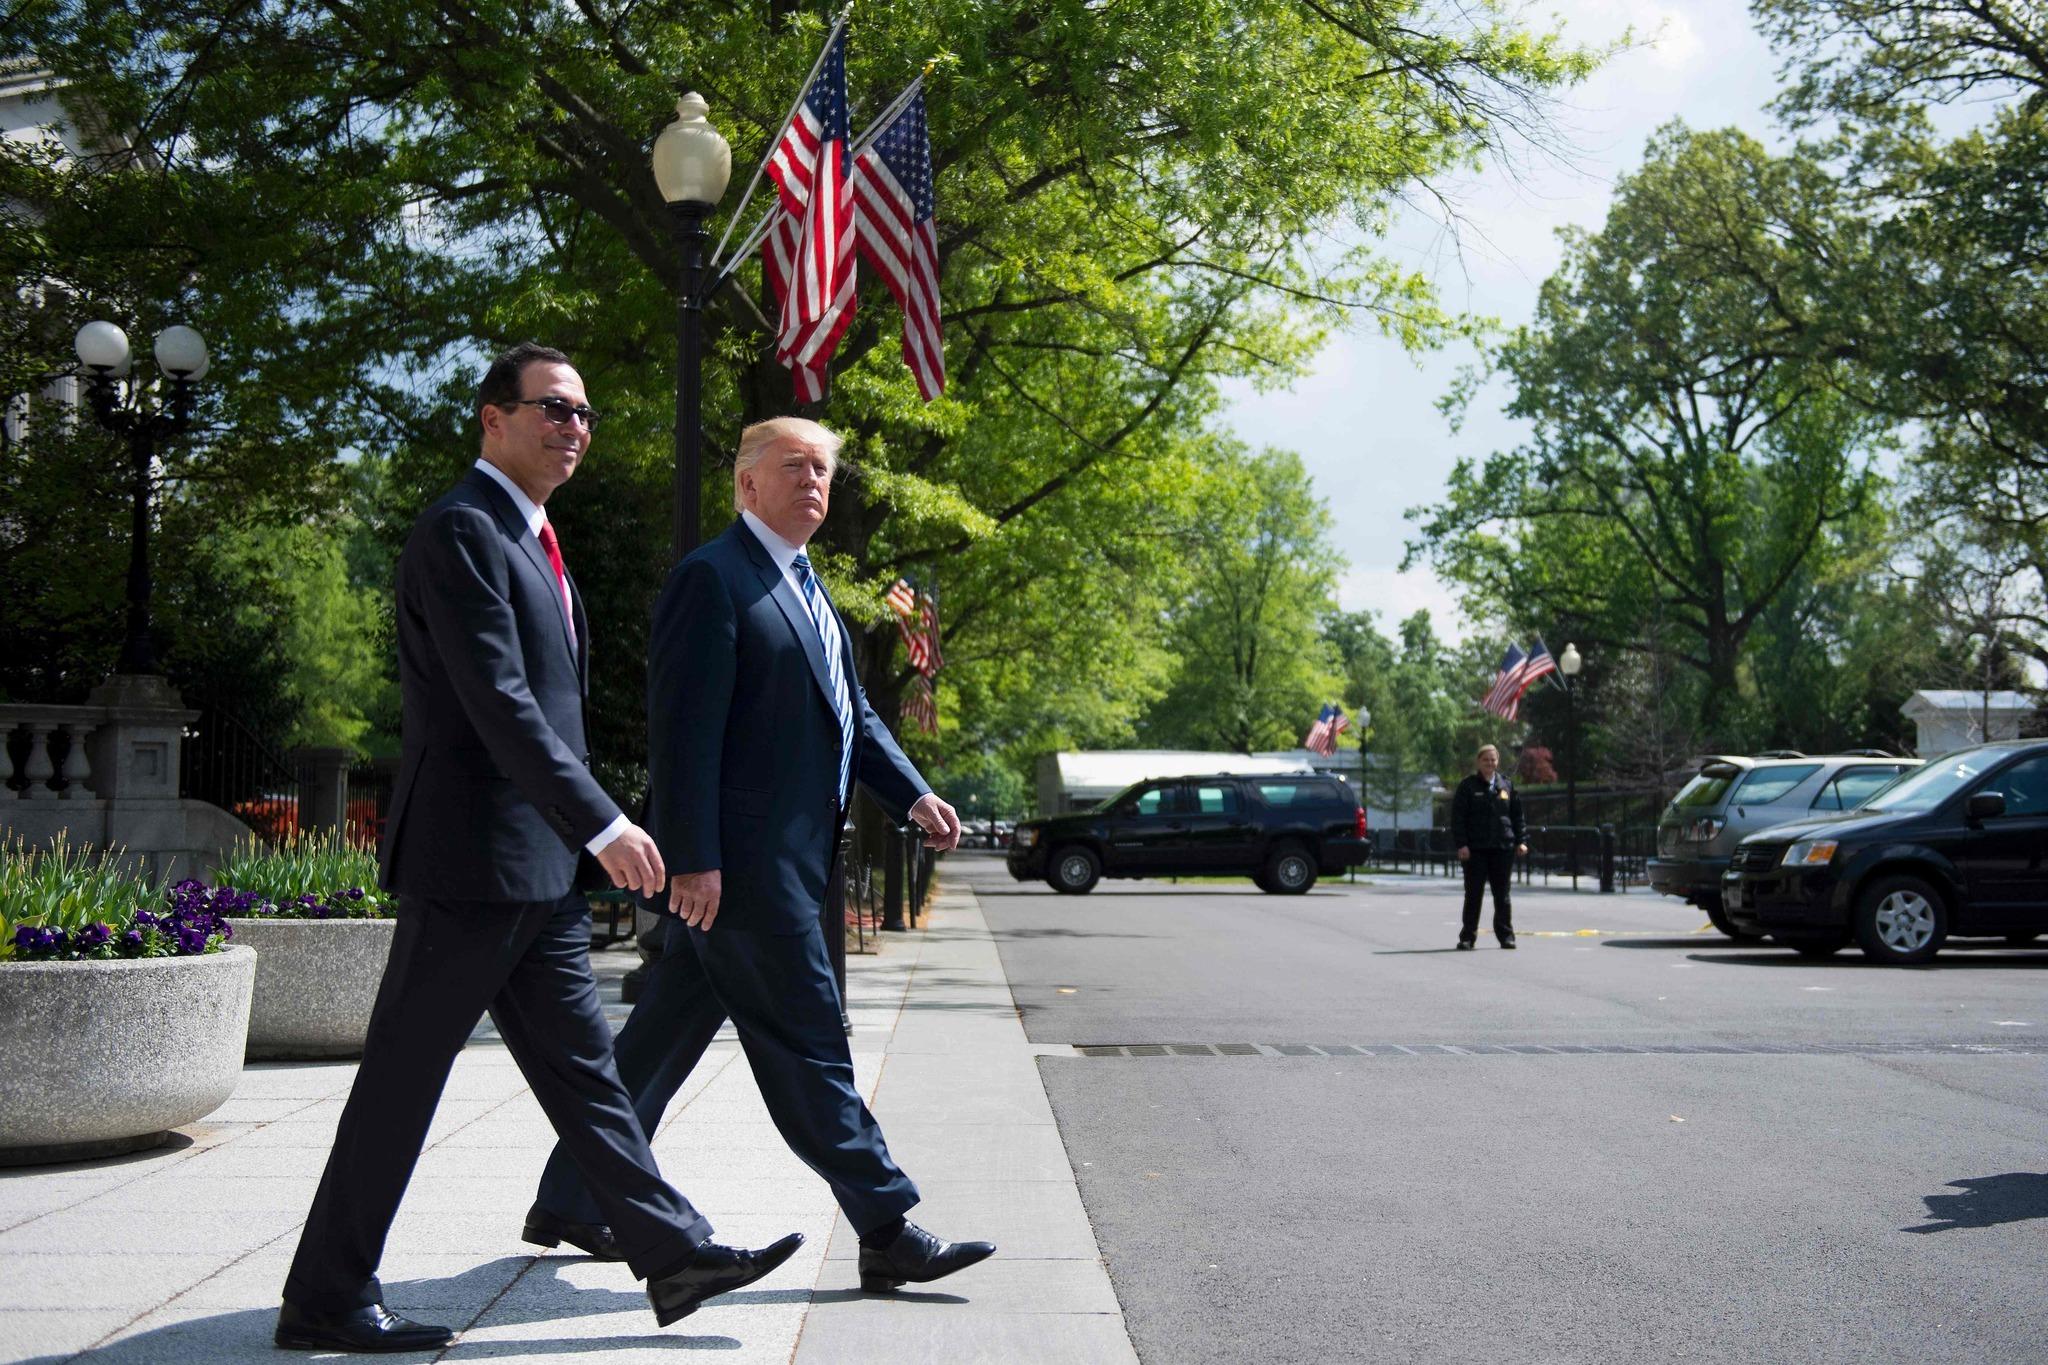 President Trump walks with Treasury Secretary Steven Mnuchin on Friday, April 21. (Jim Watson / AFP/Getty Images)